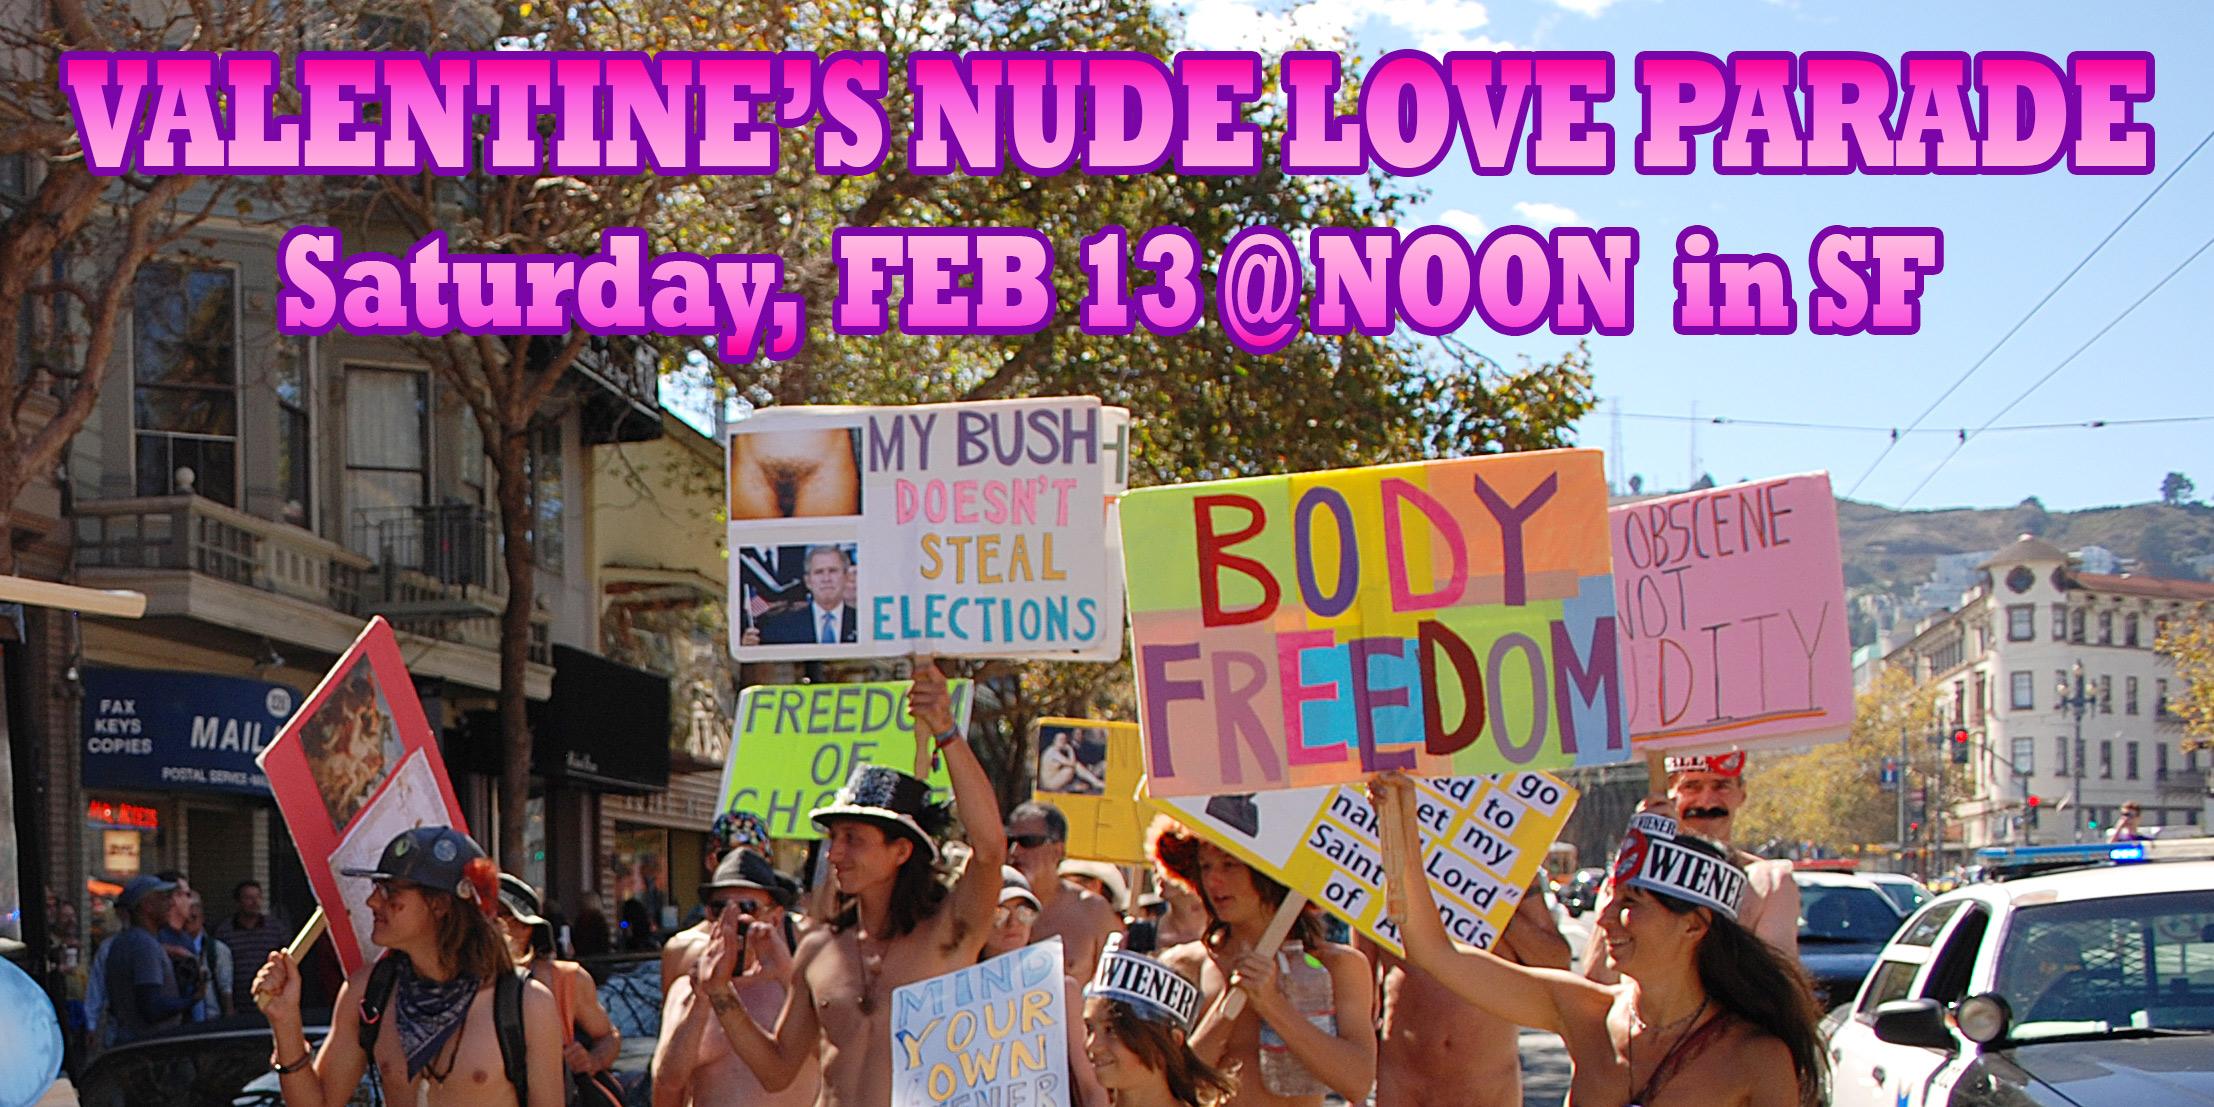 800_valentines nude parade fb bigjpg